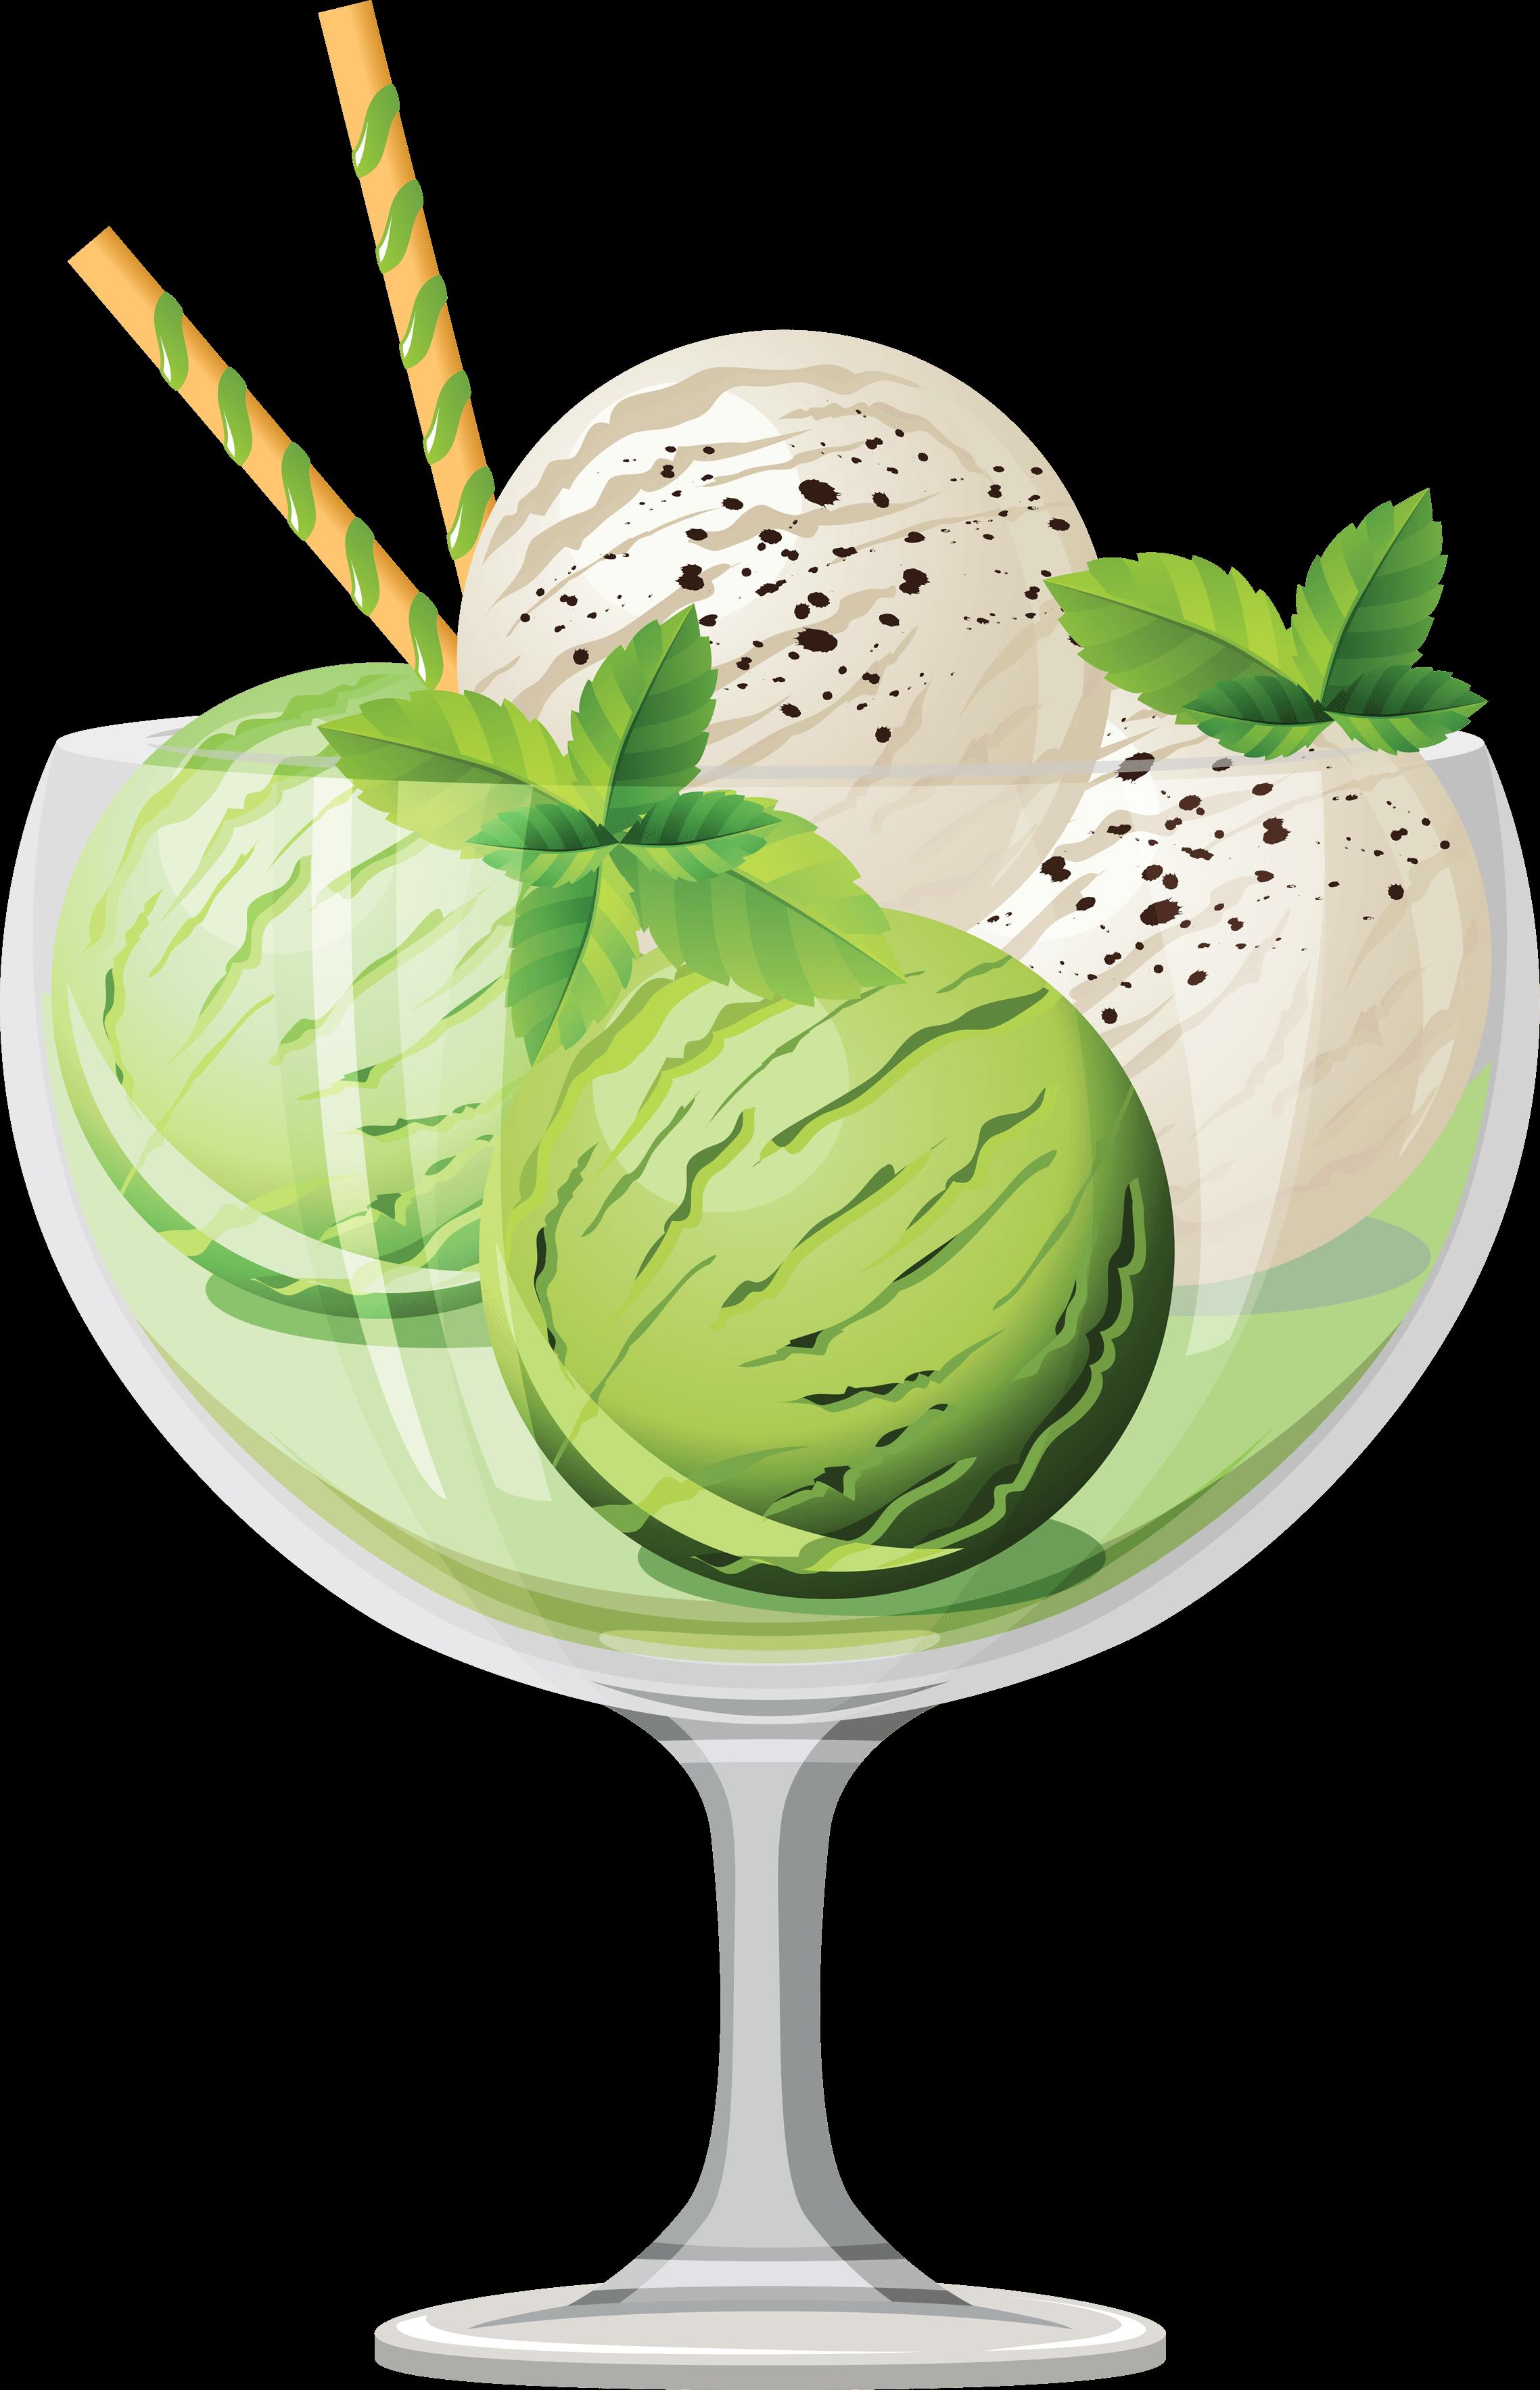 Download Fruit Ice Cream Png Image HQ PNG Image | FreePNGImg